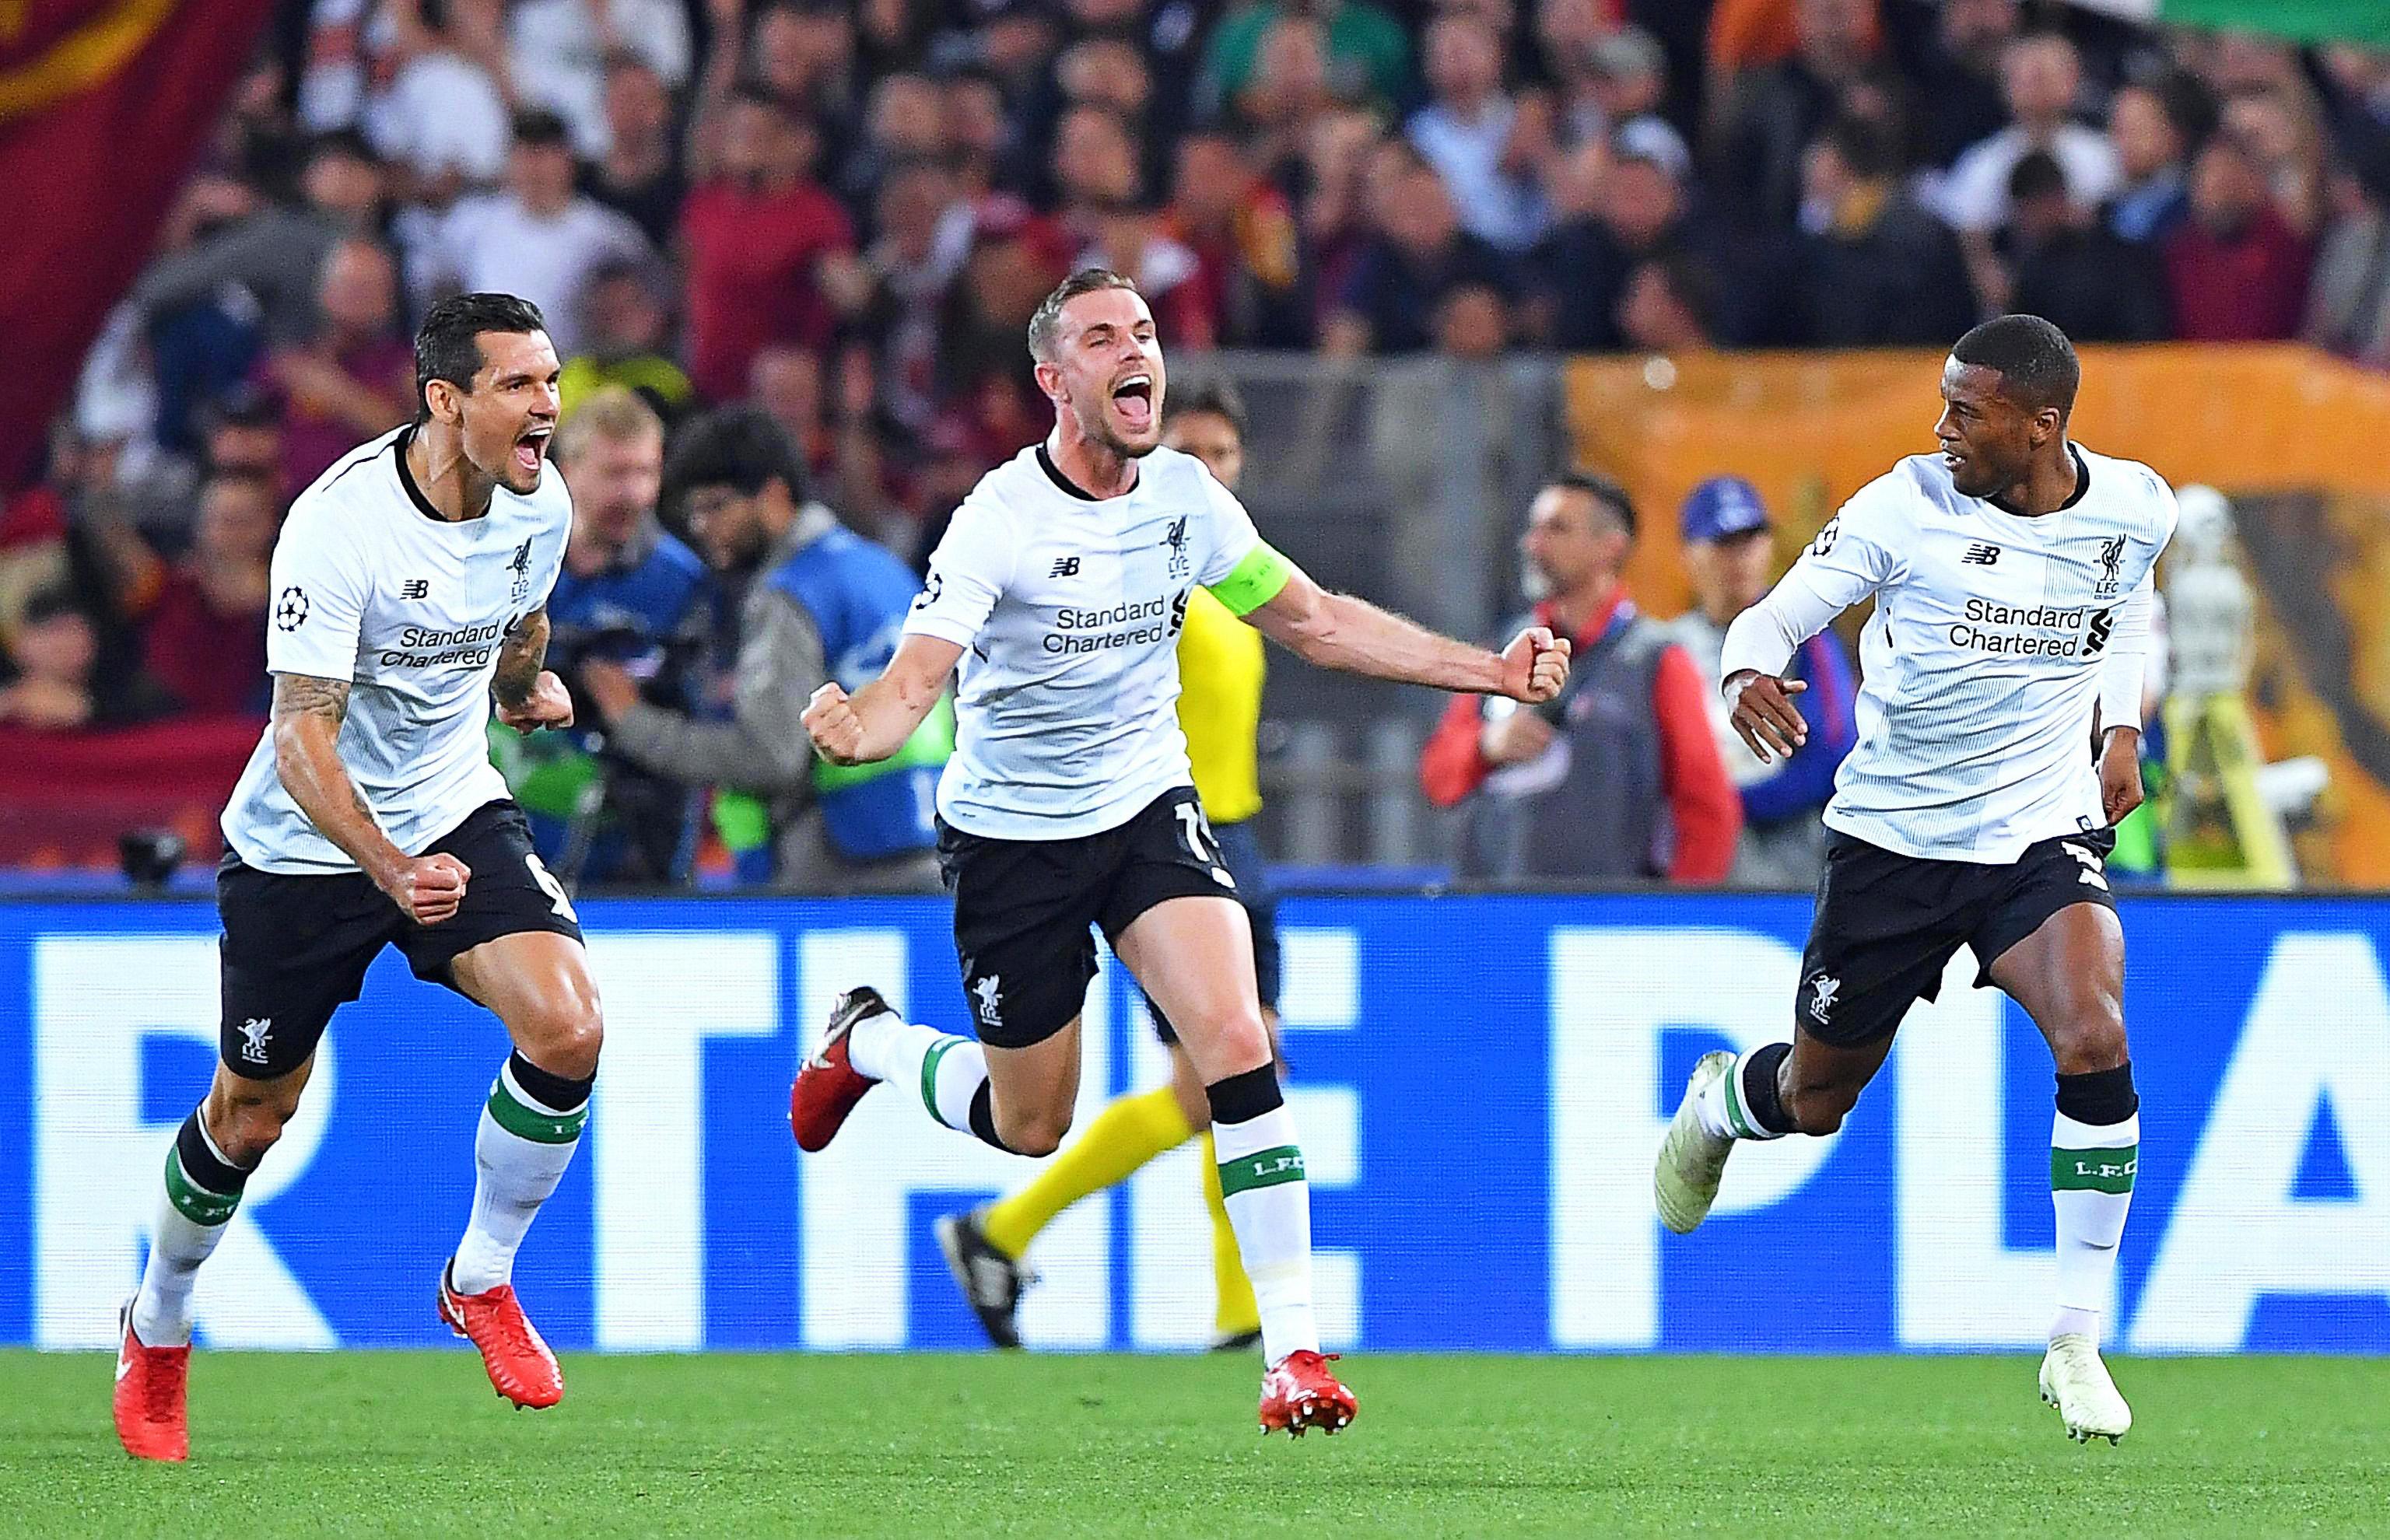 Liverpool sufrió pero ya es finalista de la Champions (EFE)